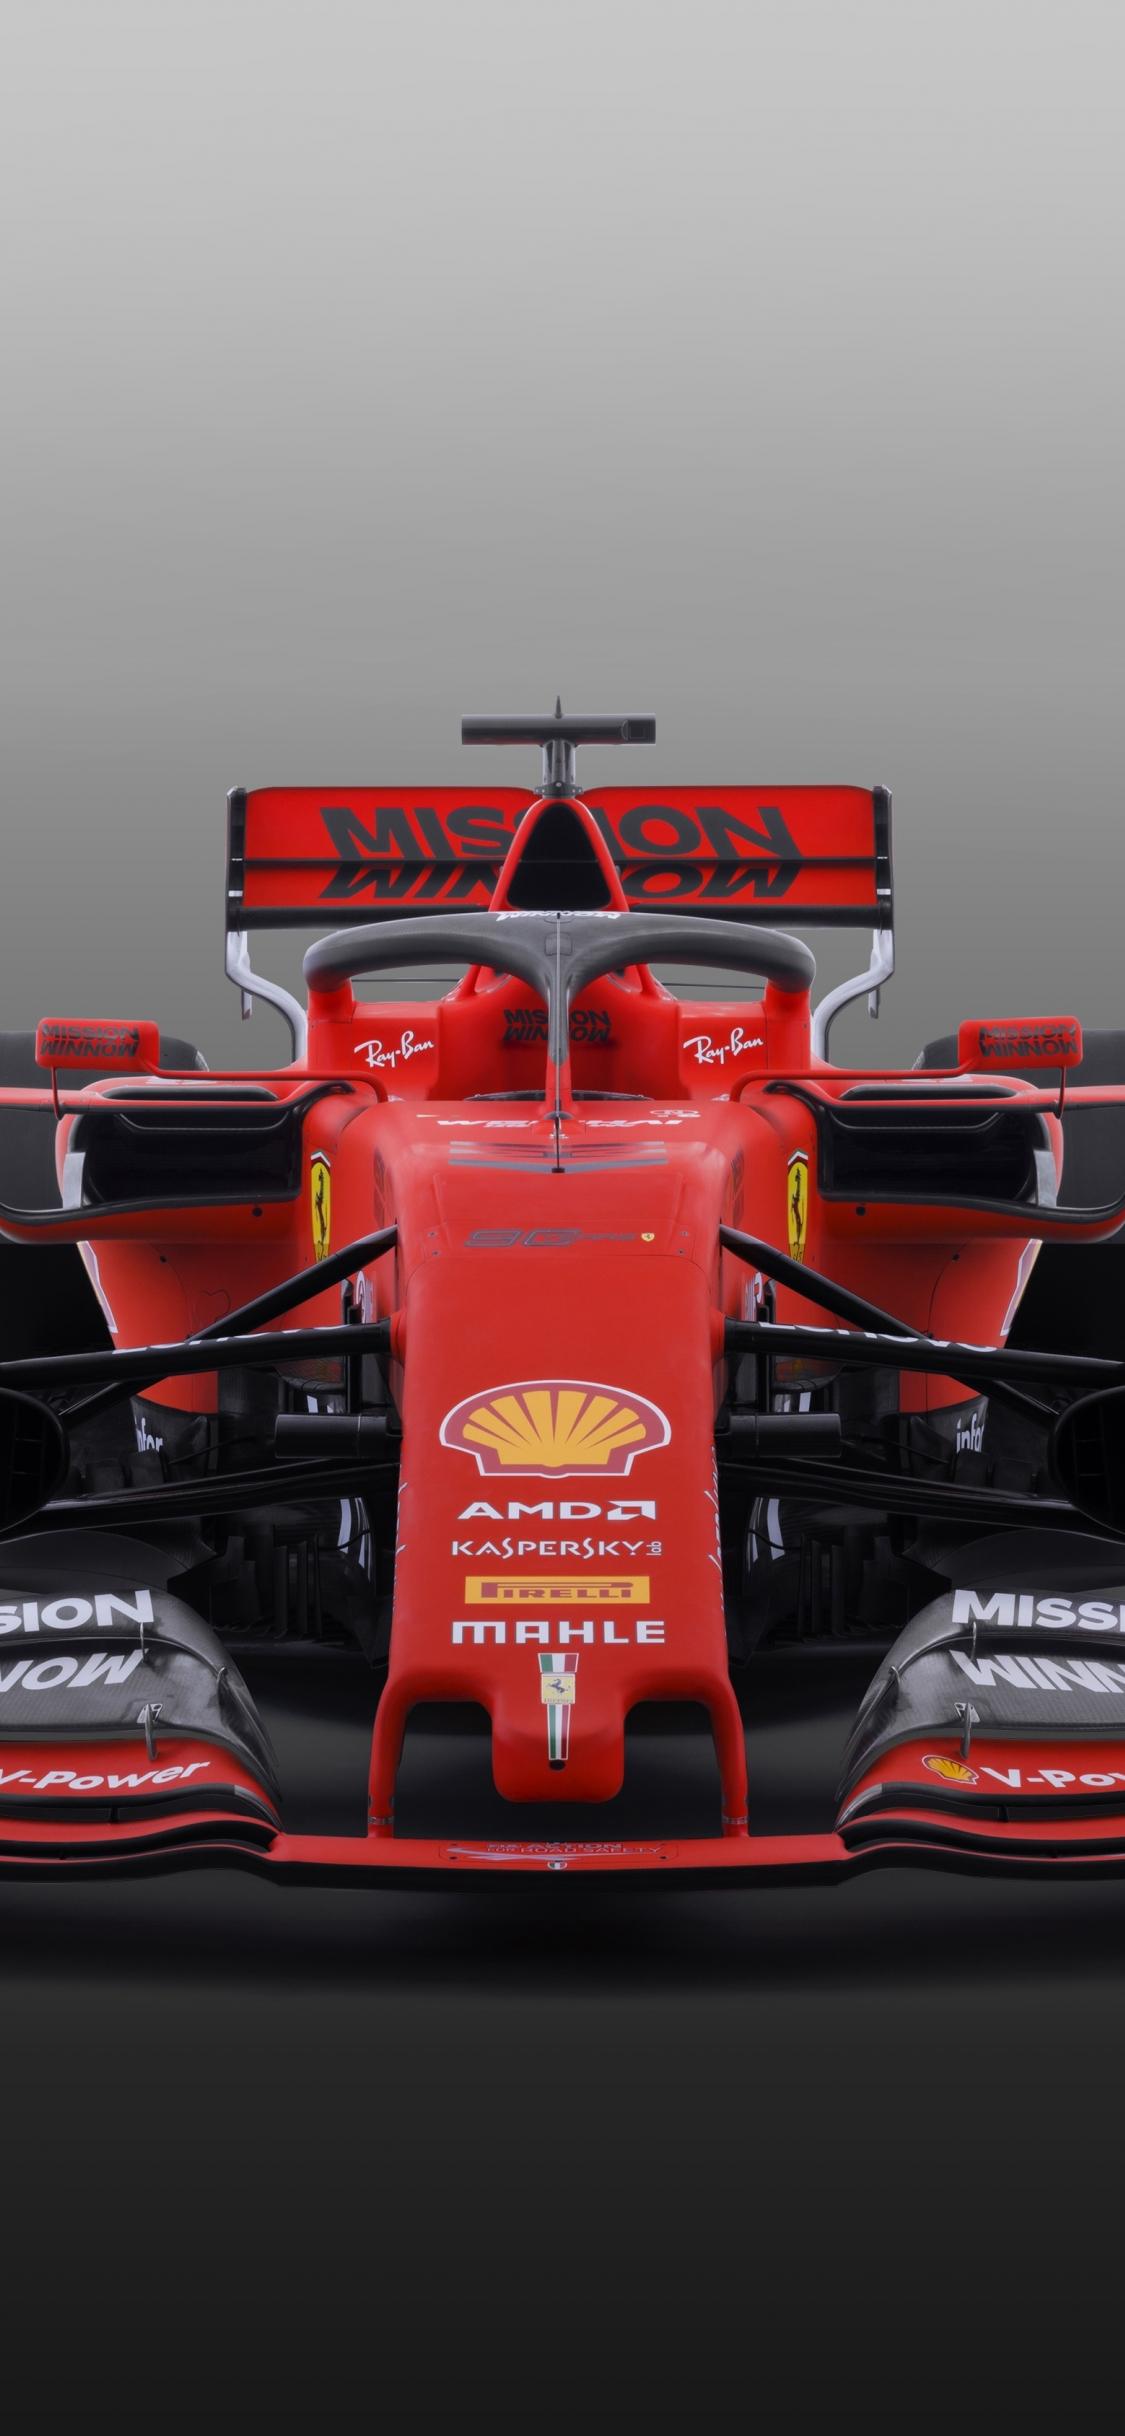 Iphone 7 Ferrari F1 Wallpaper